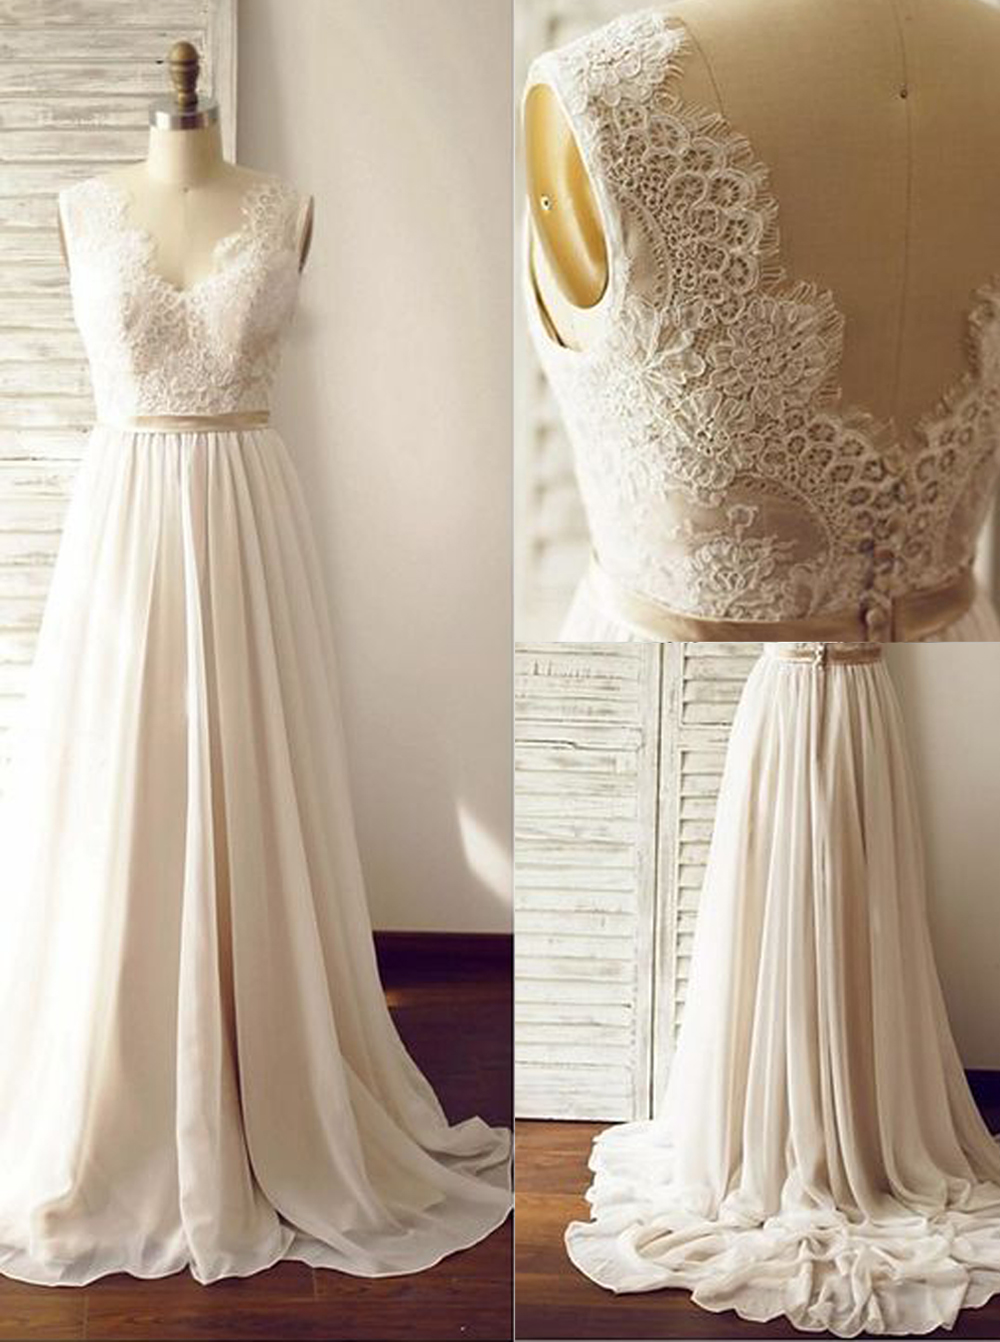 Elegant V-neck Sleeveless Sweep Train Open Back Ivory Wedding Dress with Lace Top